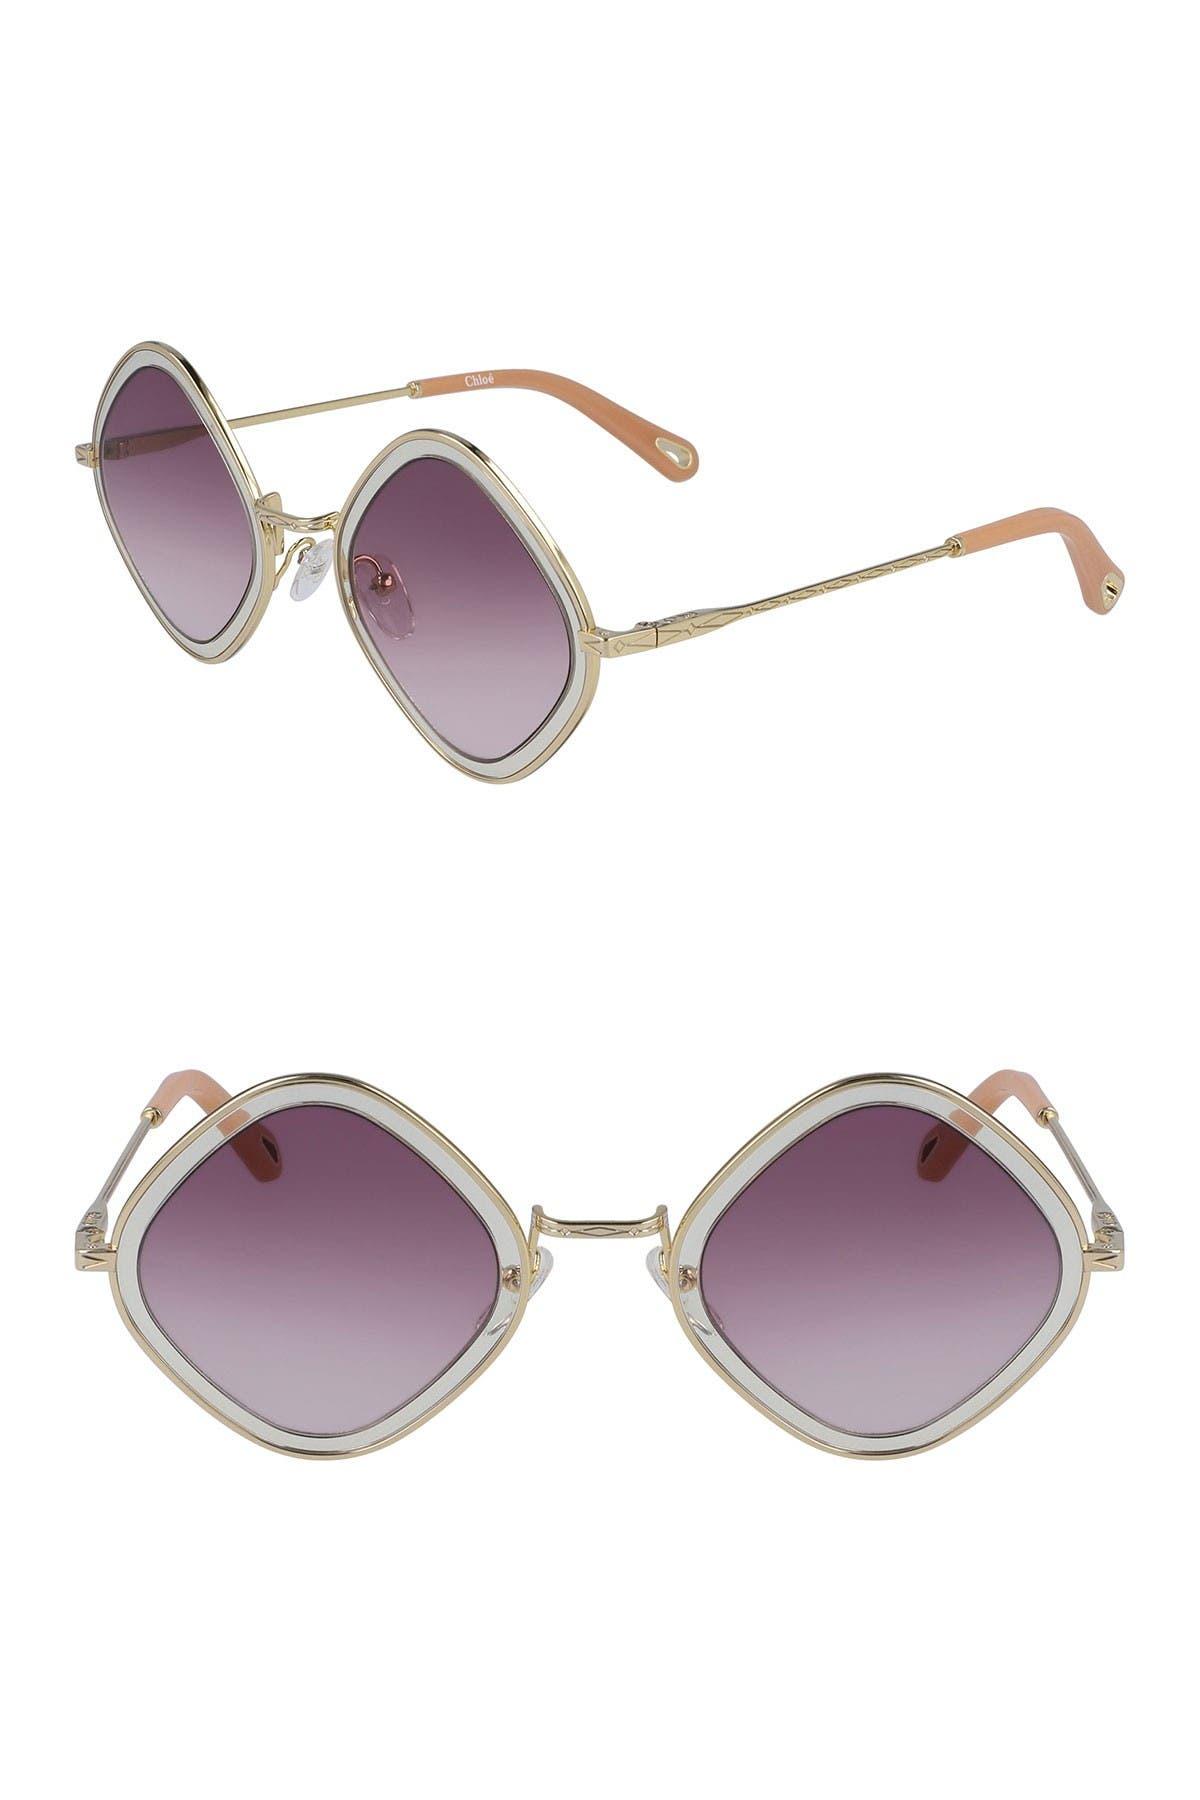 1960s Sunglasses | 70s Sunglasses, 70s Glasses Chloe Mod Rectangle 55mm Sunglasses Size NONE - Gold Poudregrd Purp at Nordstrom Rack $79.97 AT vintagedancer.com